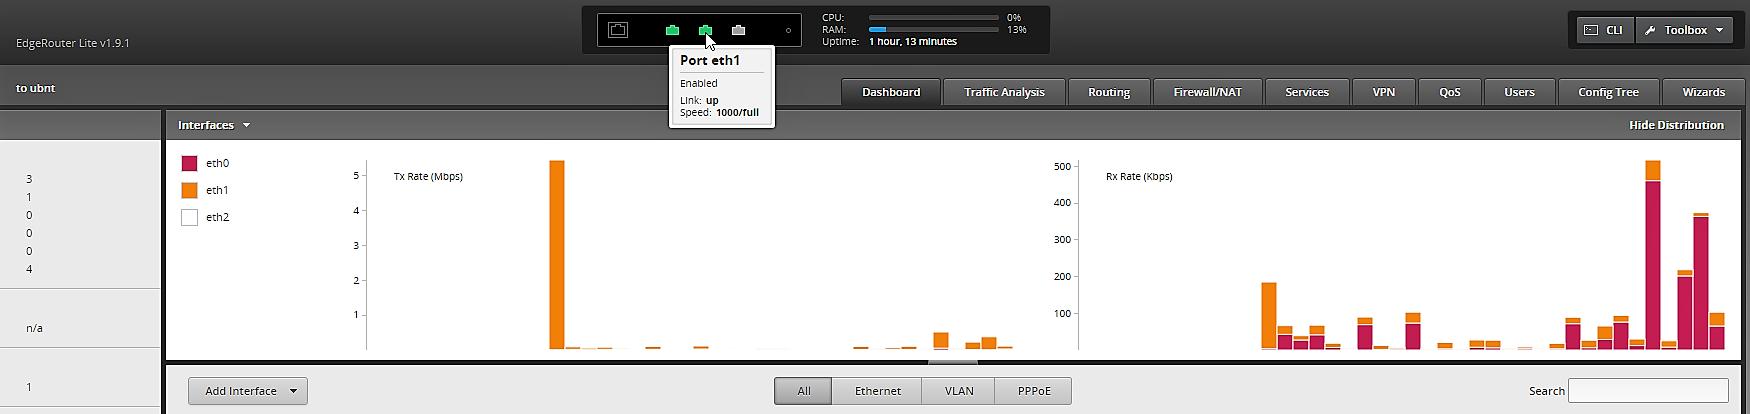 Slow downloads on Steam | Ubiquiti Community